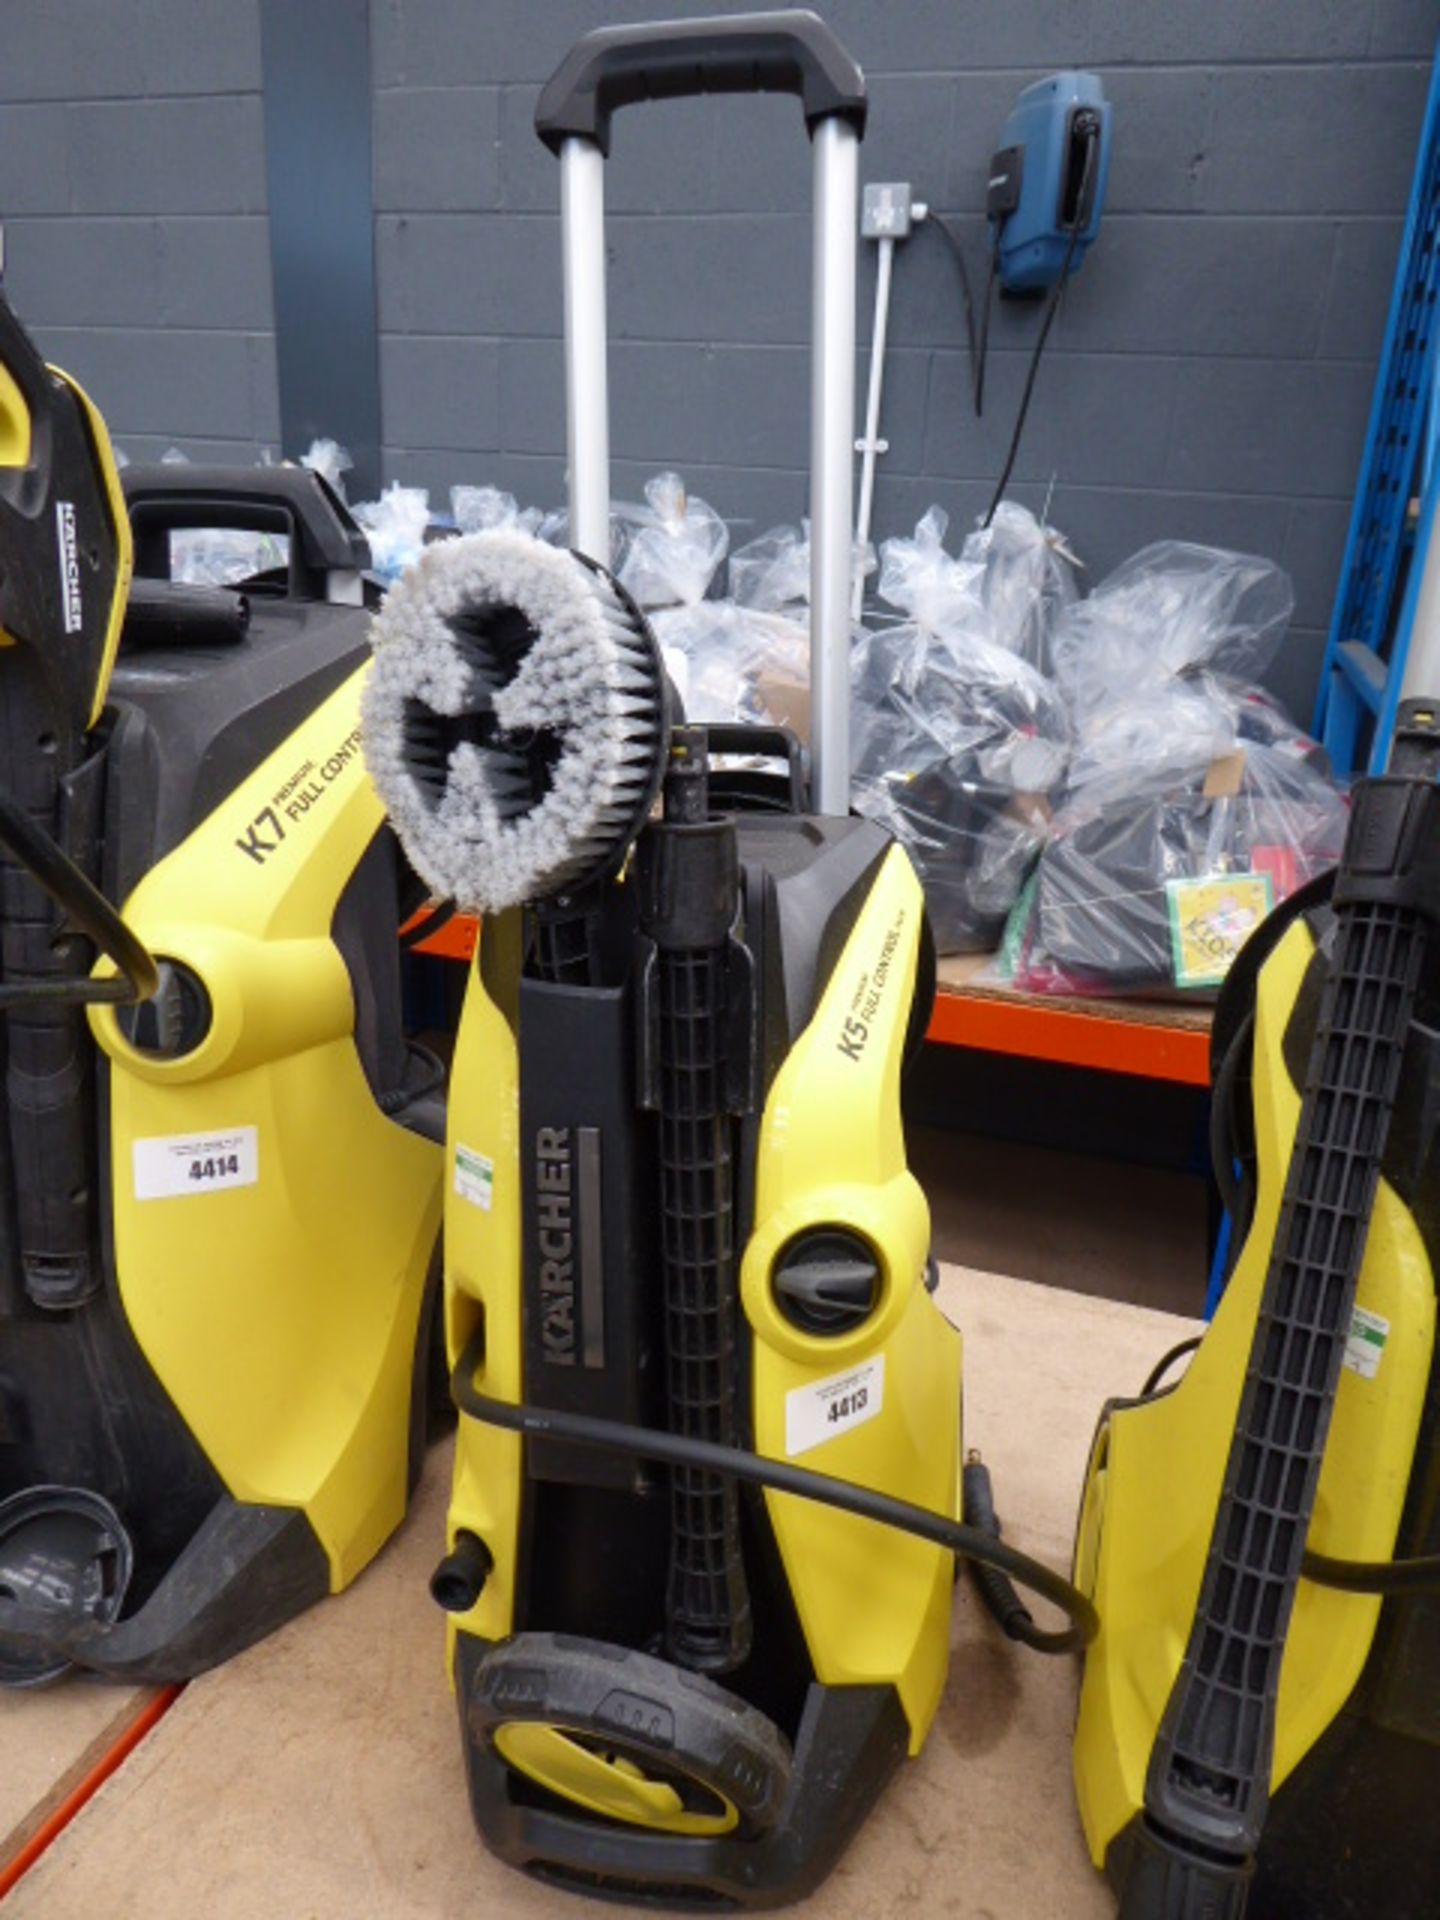 Lot 4413 - Karcher K5 premium full control electric pressure washer